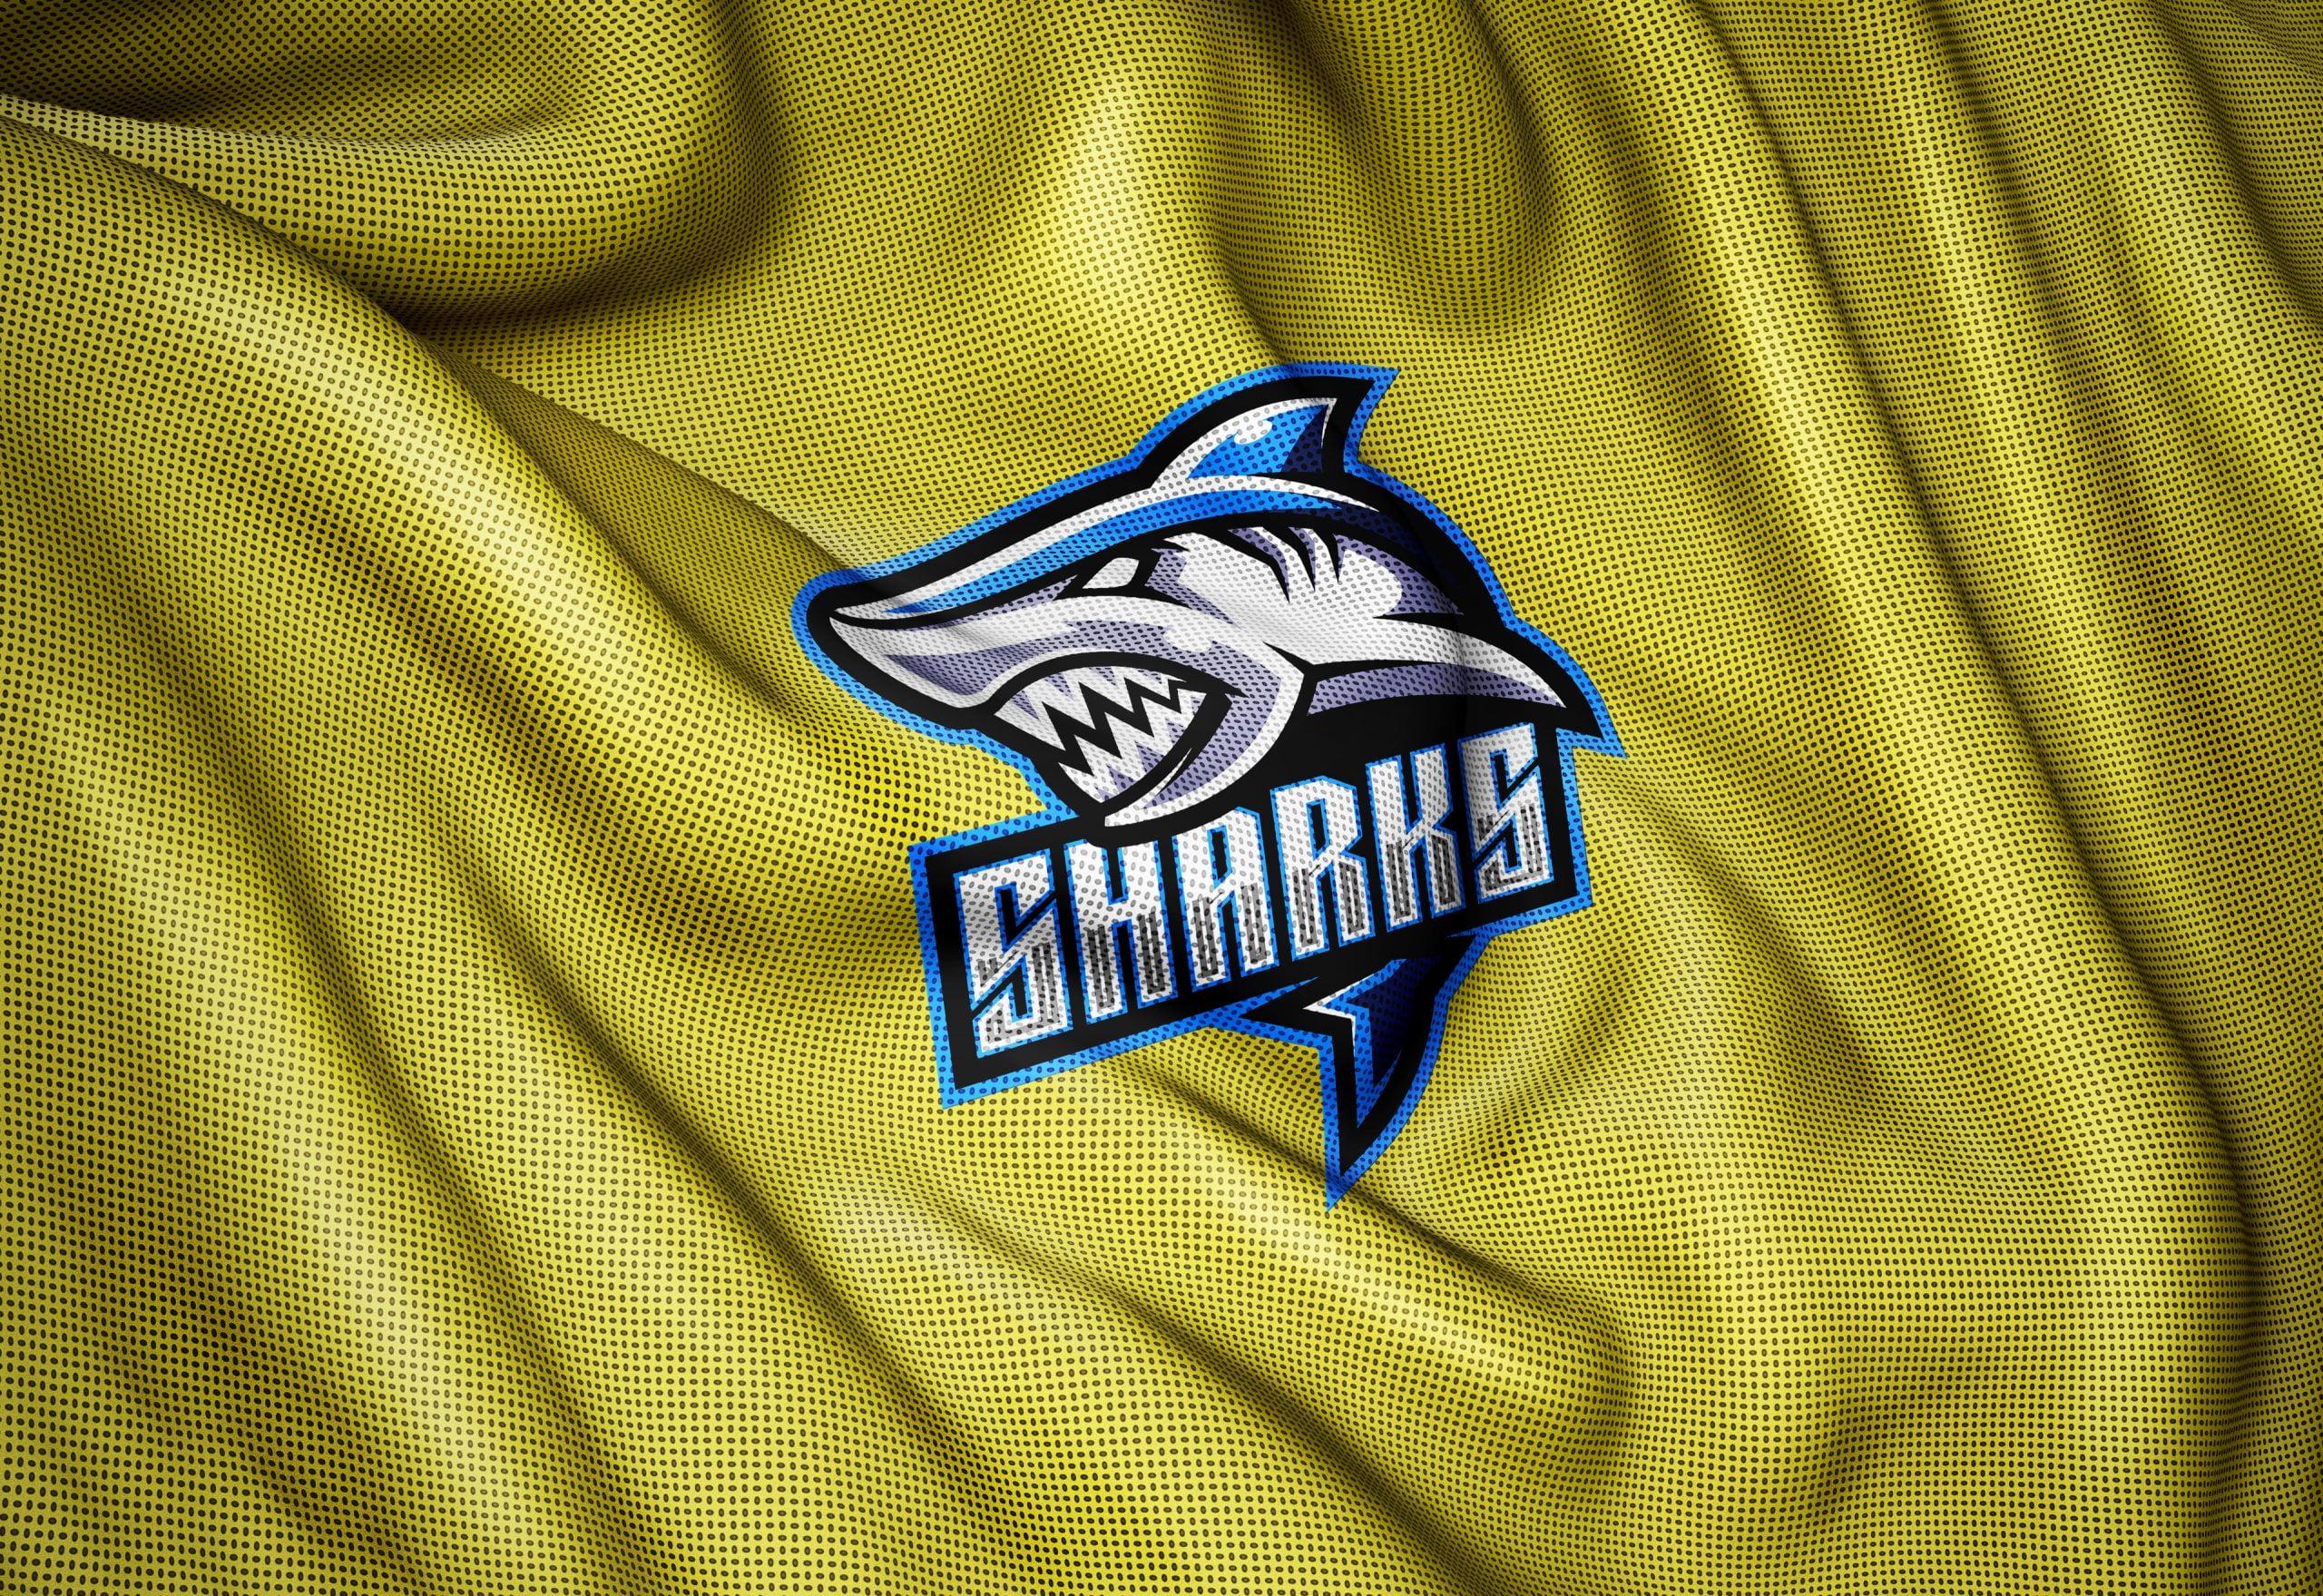 : Sharks-Mascot-Logo-Sports-Jersey-Fabric-Texture-Photoshop-Logo-Mockup